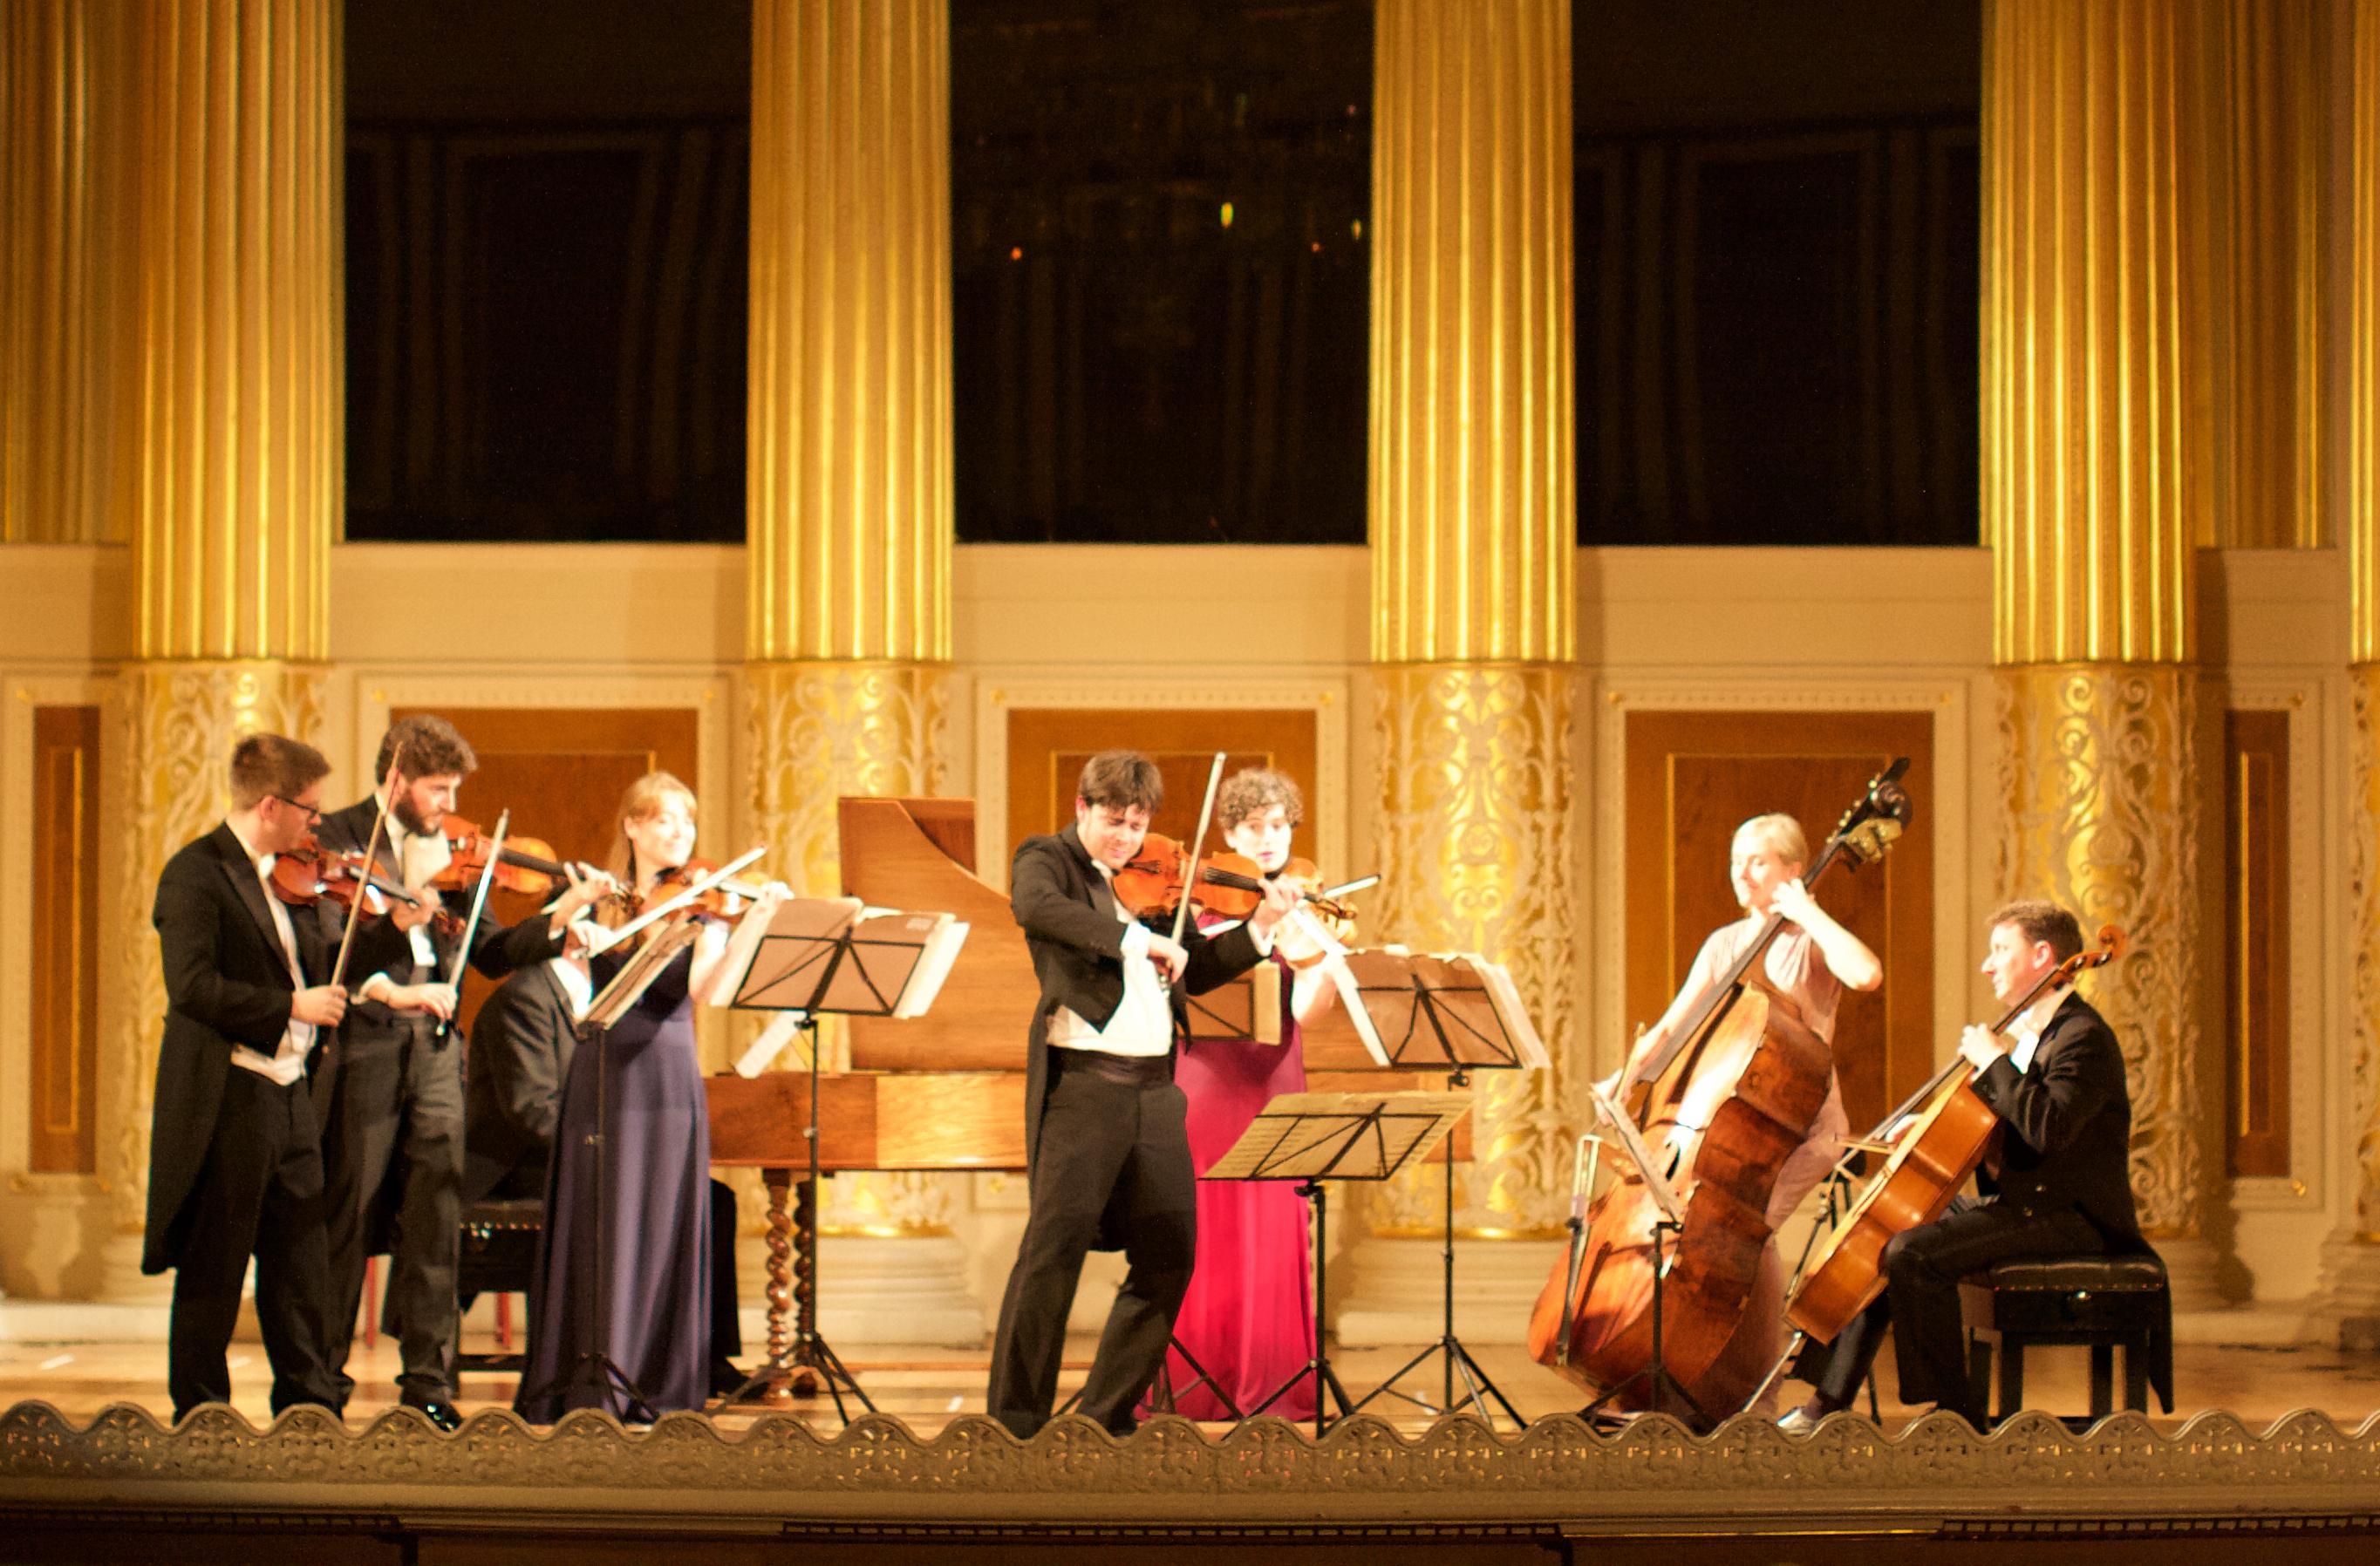 LONDON CONCERTANTE - Vivaldi Four Seasons by